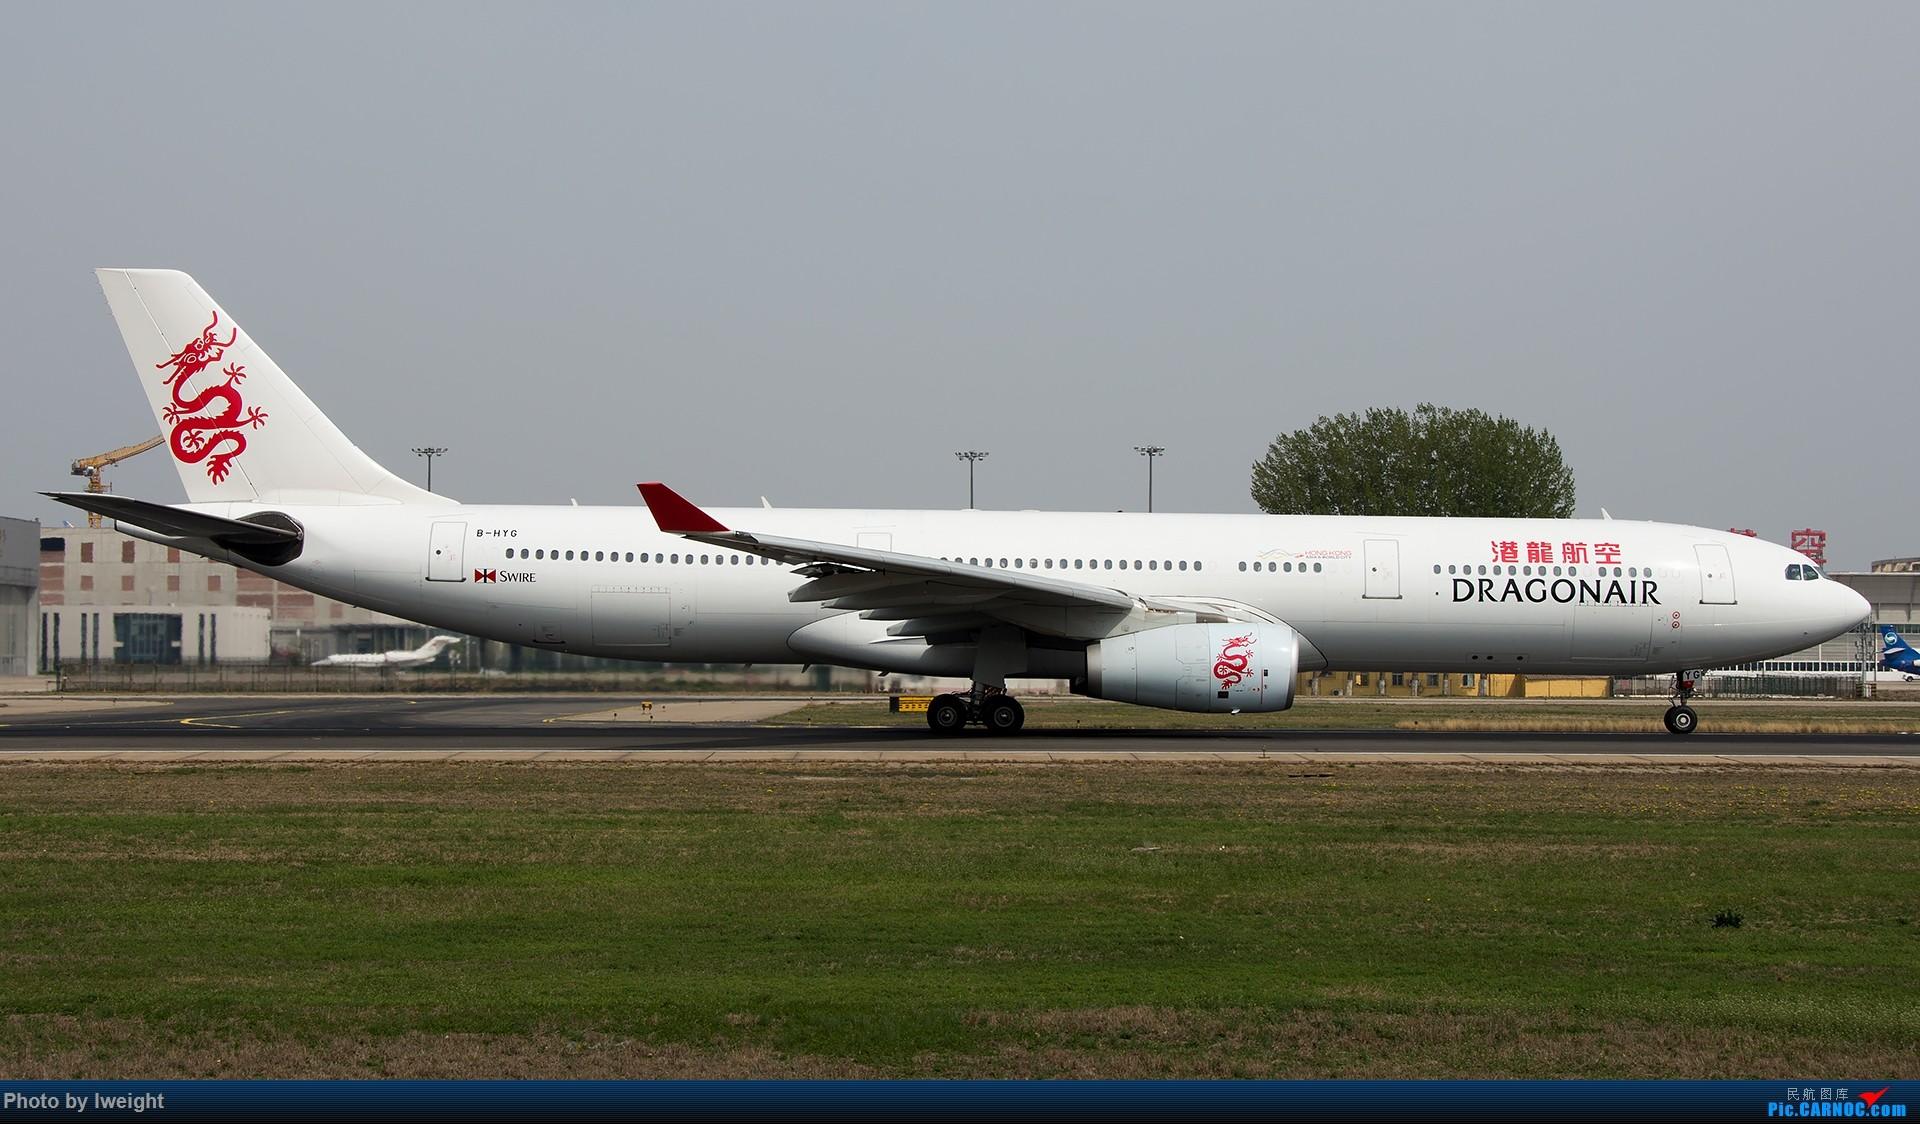 Re:[原创]霾,18R,高密度 AIRBUS A330-300 B-HYG 中国北京首都国际机场